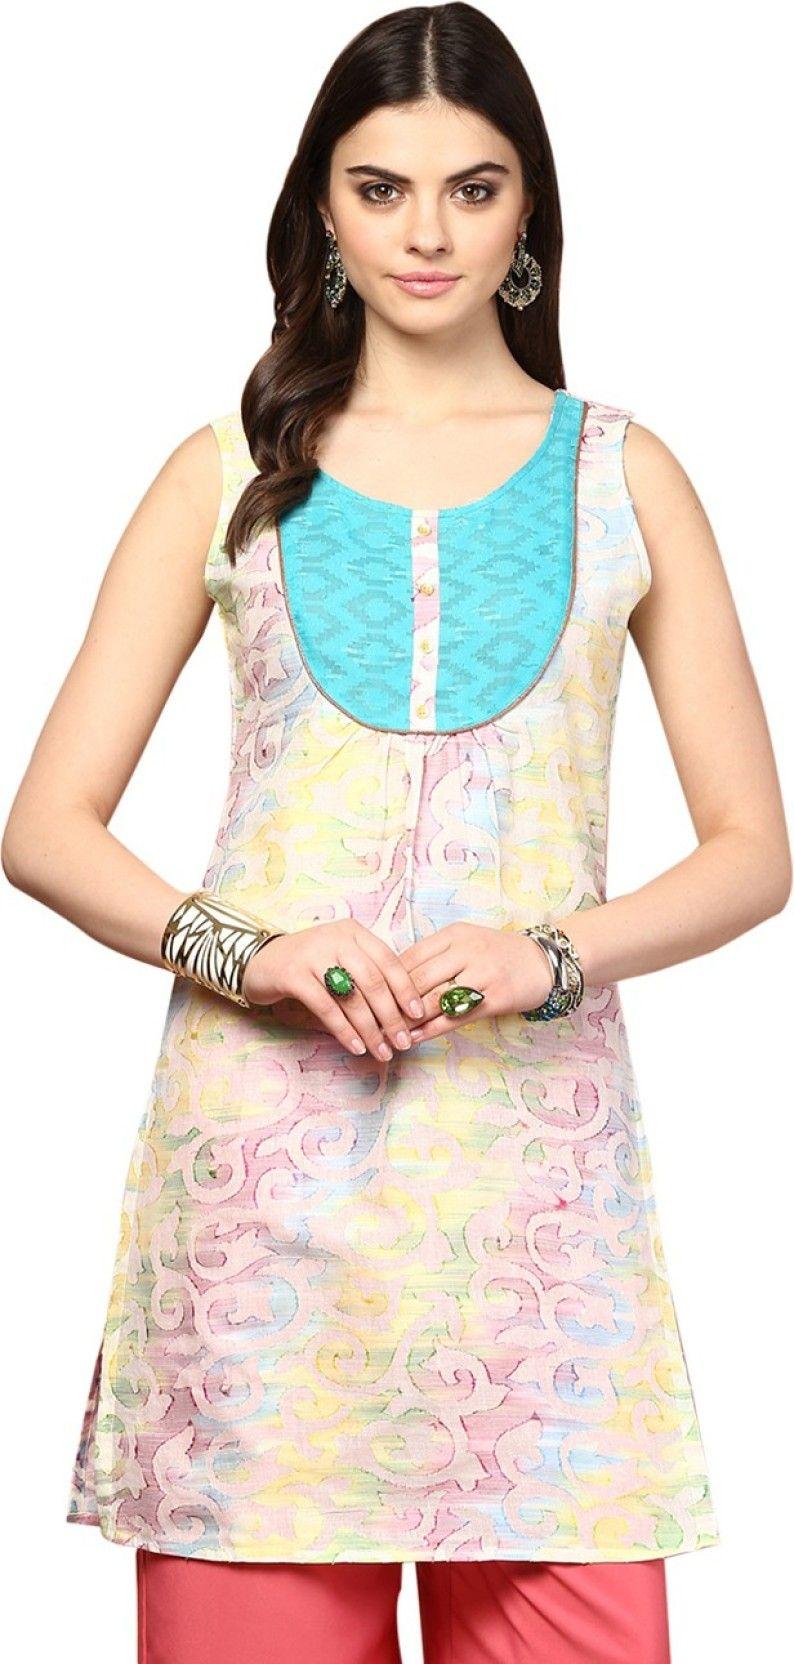 137c86128 Yepme Casual Printed Women s Kurti - Buy Multicolor Yepme Casual Printed  Women s Kurti Online at Best Prices in India